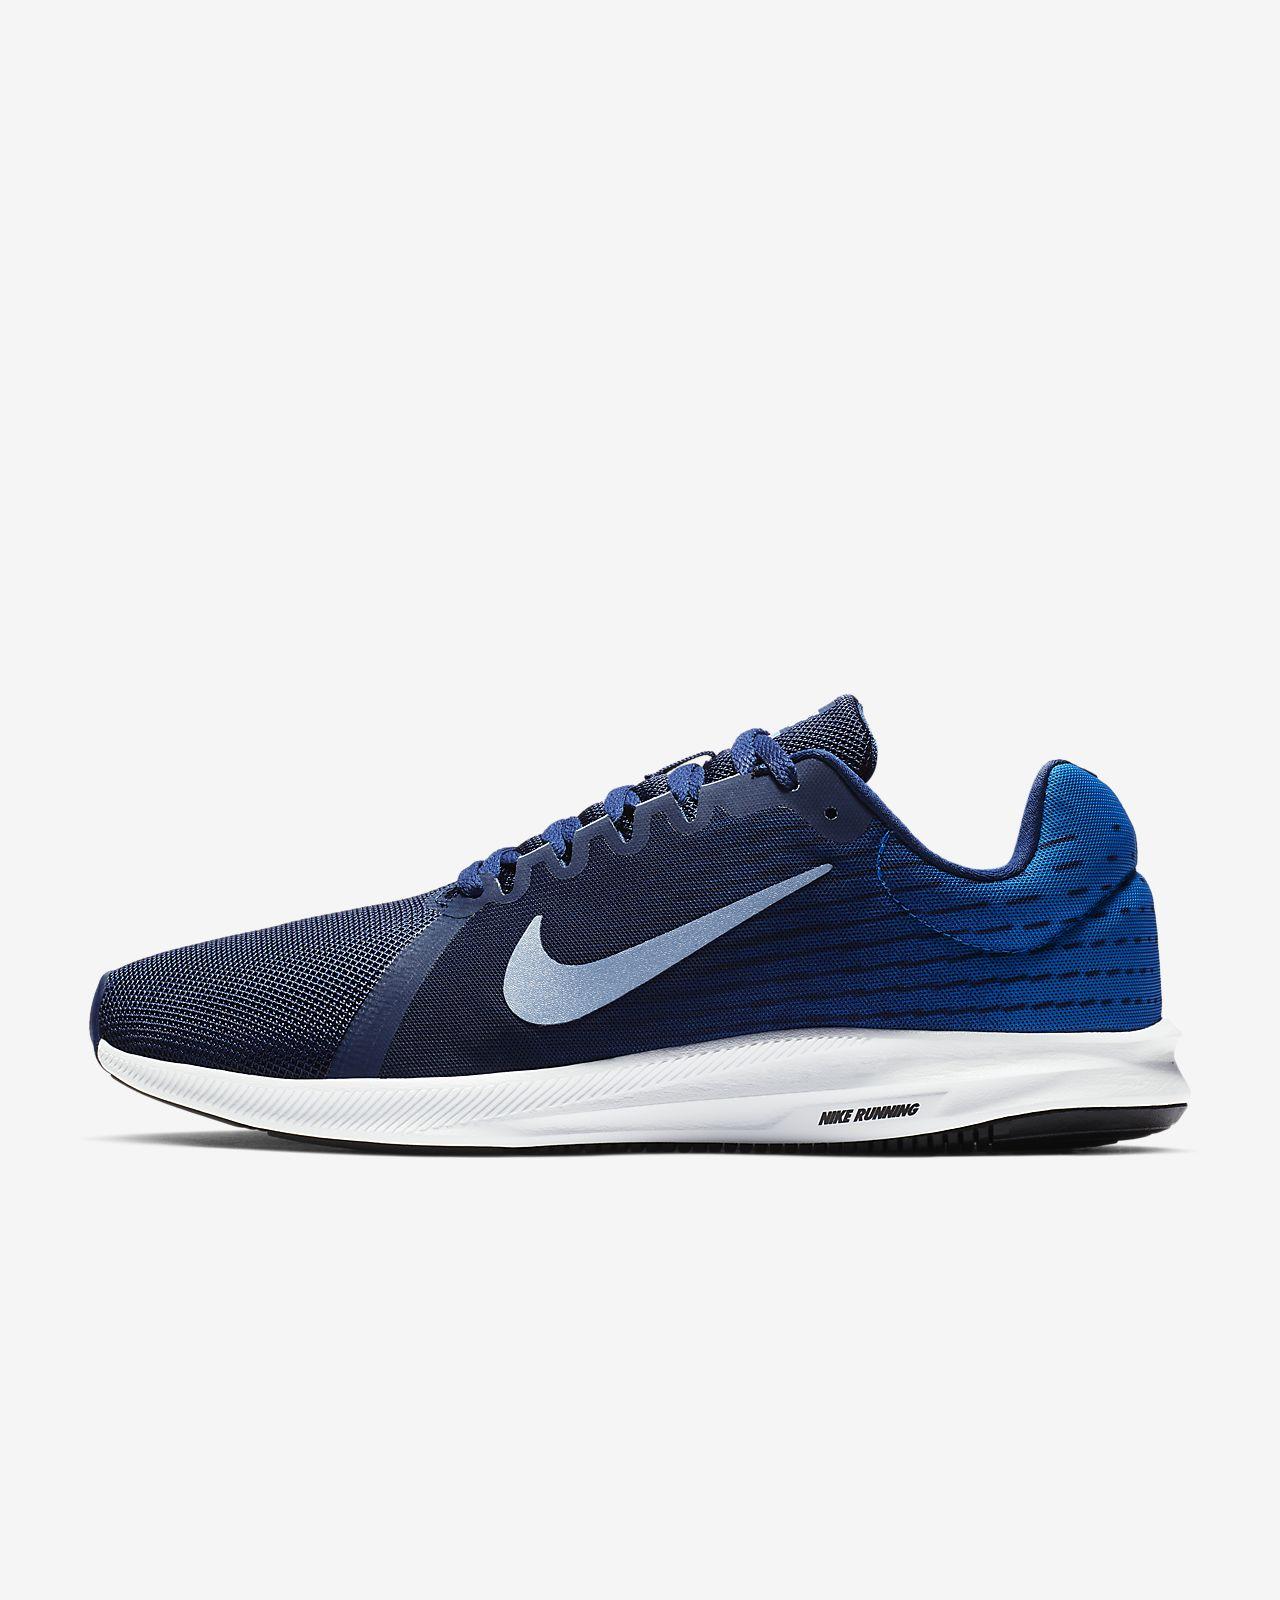 b8f40d703d3 Chaussure de running Nike Downshifter 8 pour Homme. Nike.com BE